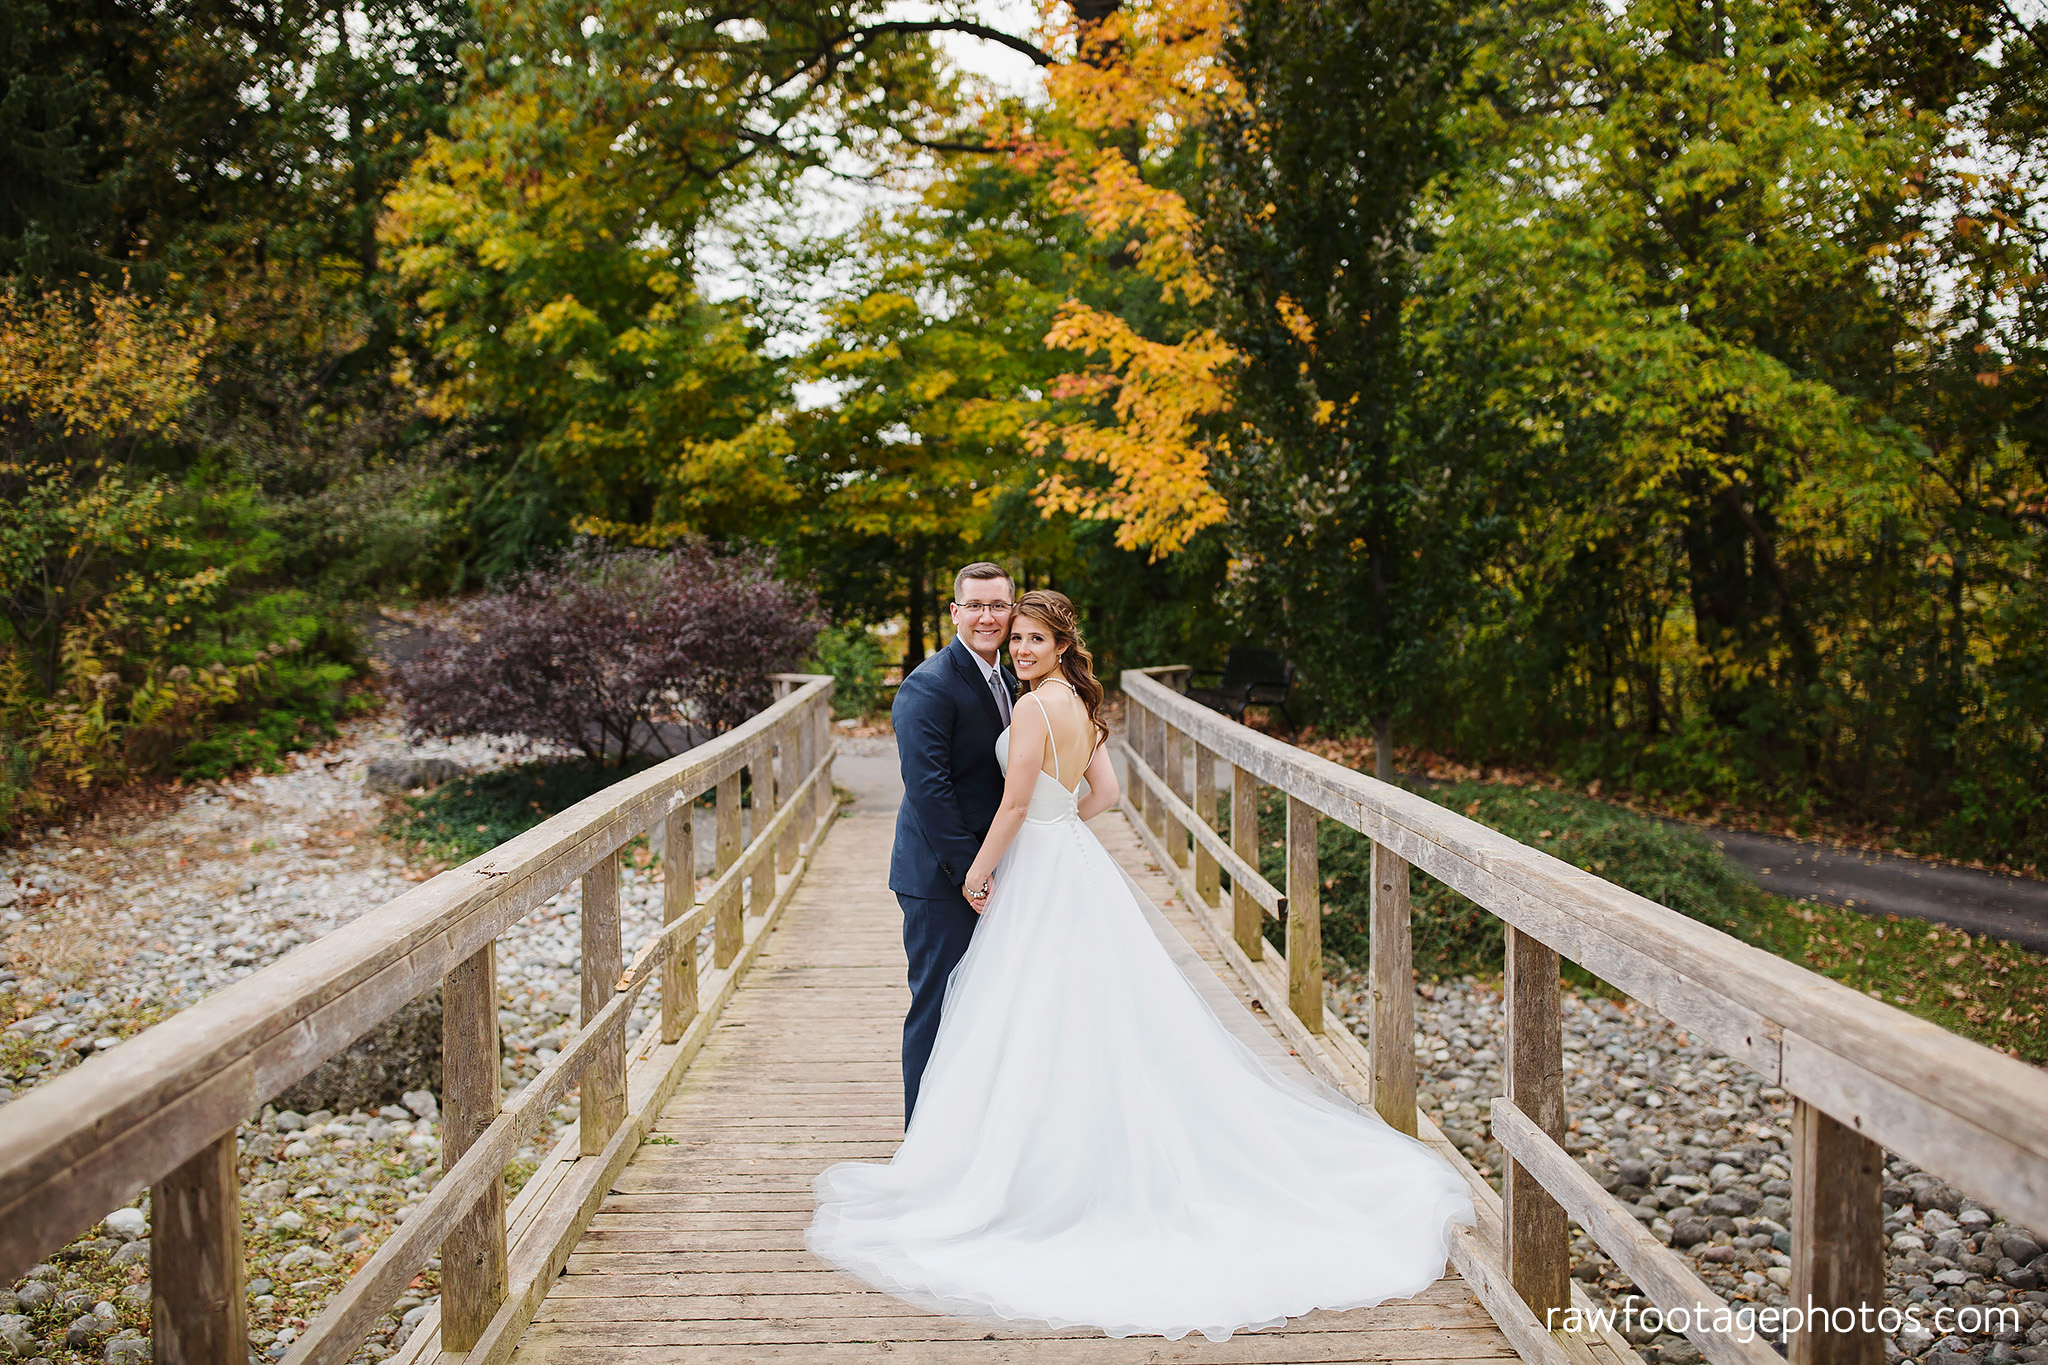 london_ontario_wedding_photographer-civic_gardens-springbank_park-succulent_bouquet-fall_wedding-bridge-raw_footage_photography061.jpg